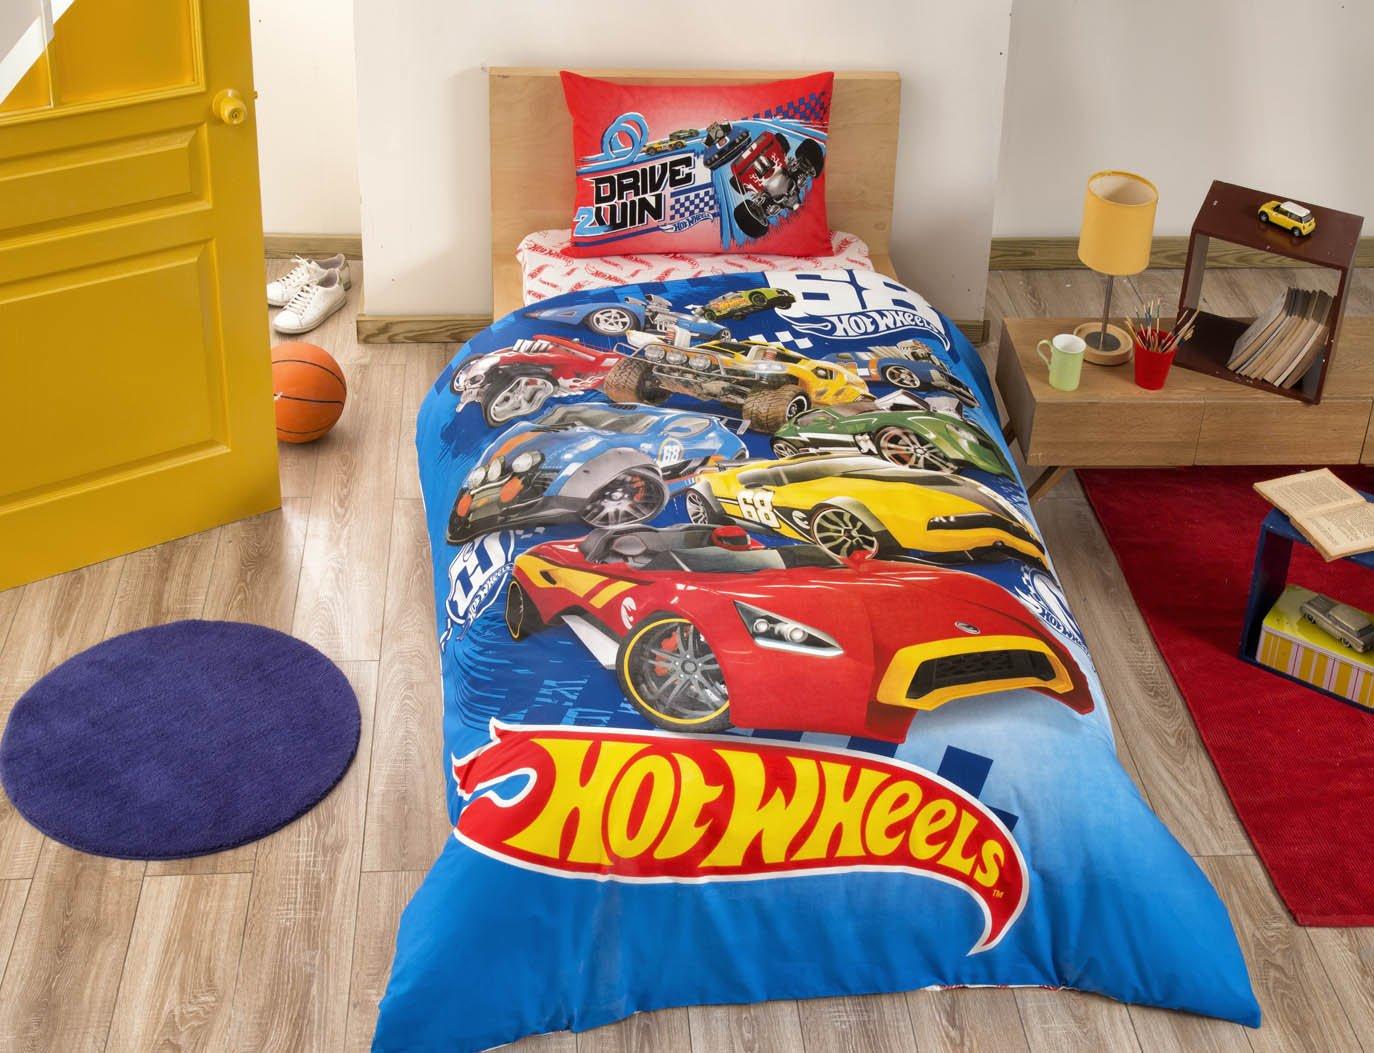 COMFORTER SET Hot Wheels Boy's Kid's Single / Twin Size Comforter Cover Set+++White Microfiber Comforter(Look 2.Image)Kids Bedding 4 Pcs